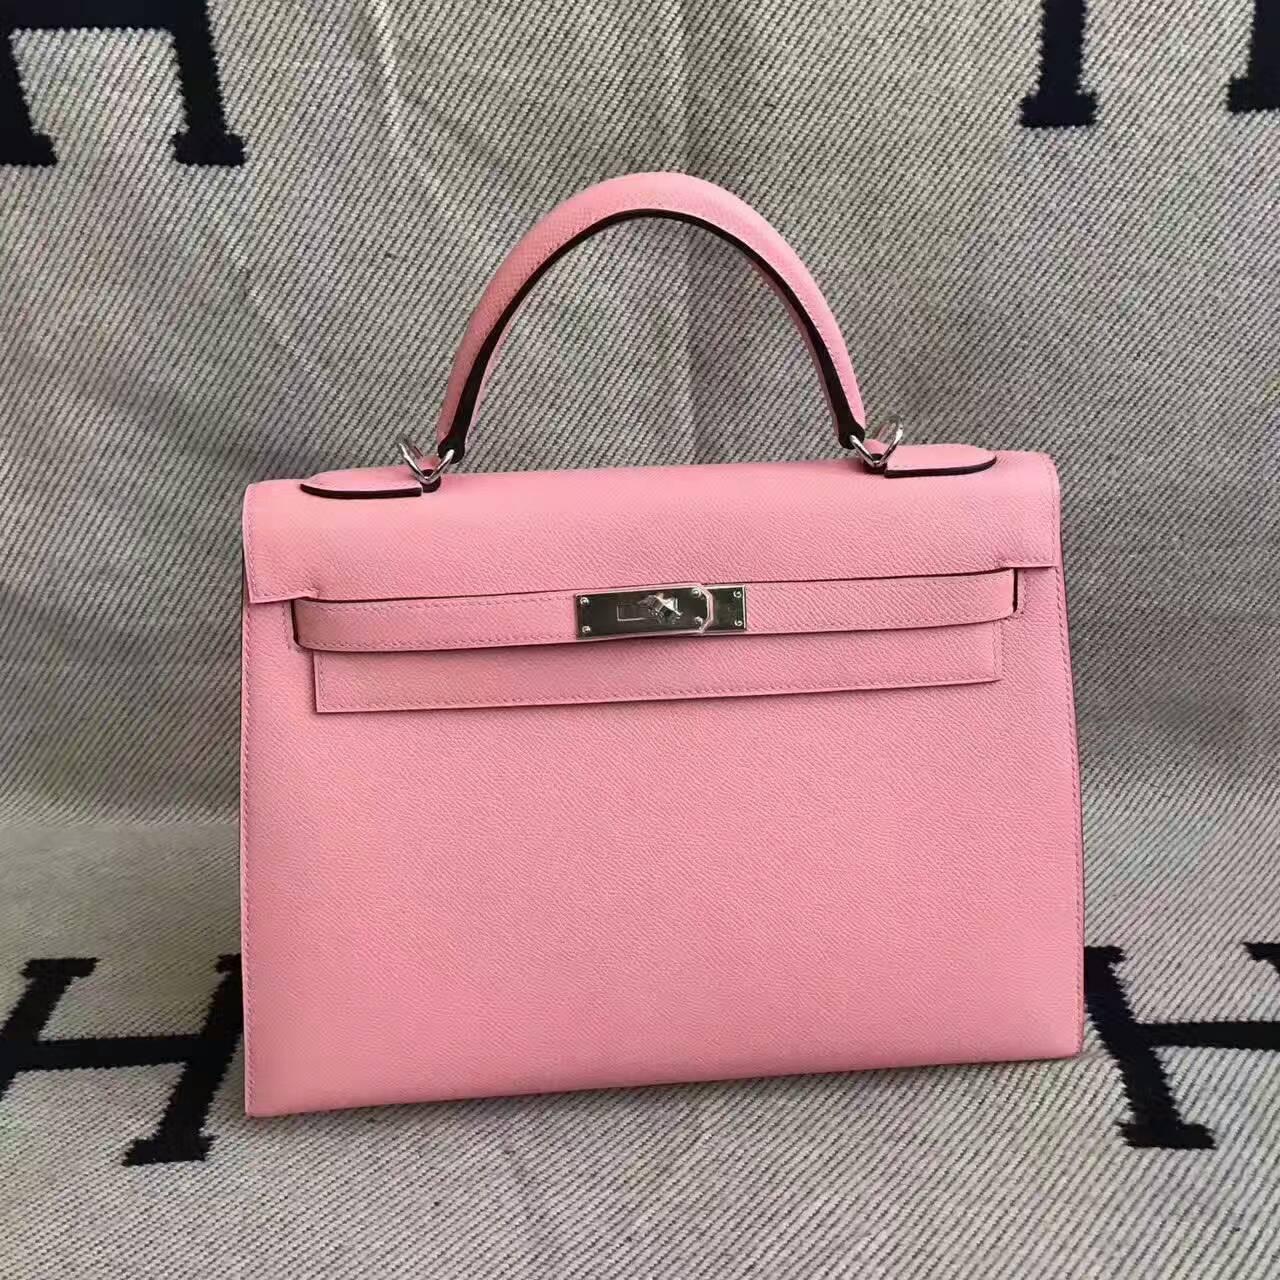 New Pretty Hermes Kelly32cm Handbag in 1Q Rose Confetti Epsom Leather